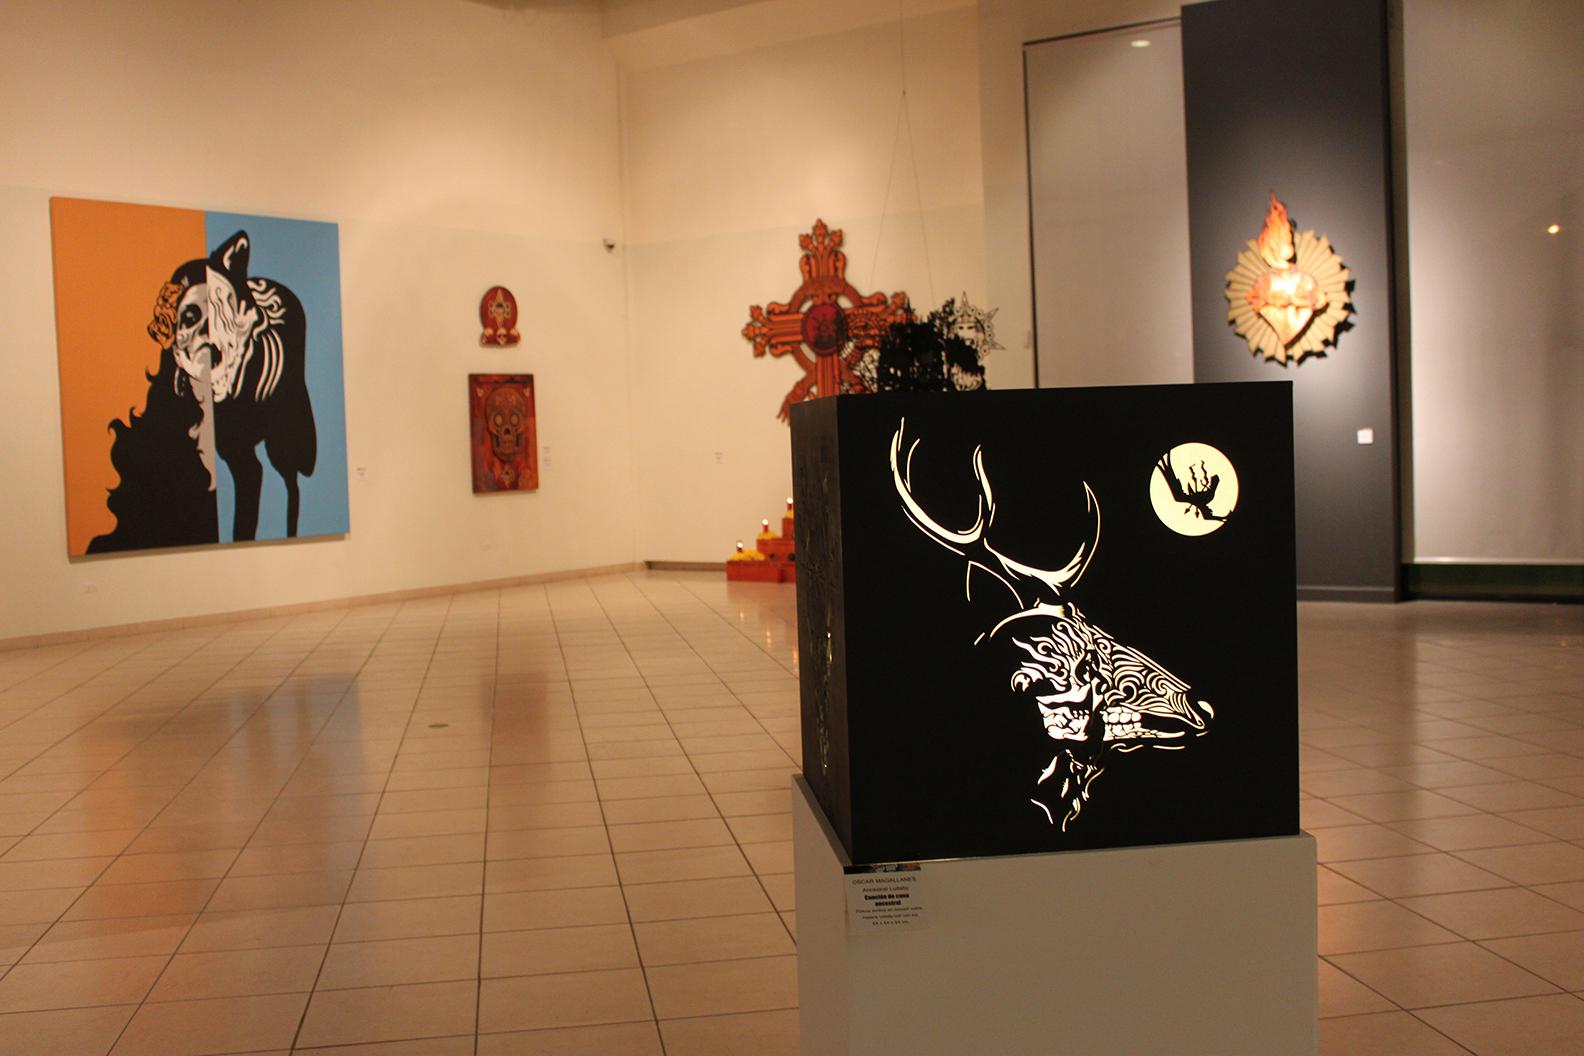 Oscar Magallanes, CEART, Mexicali, 2014